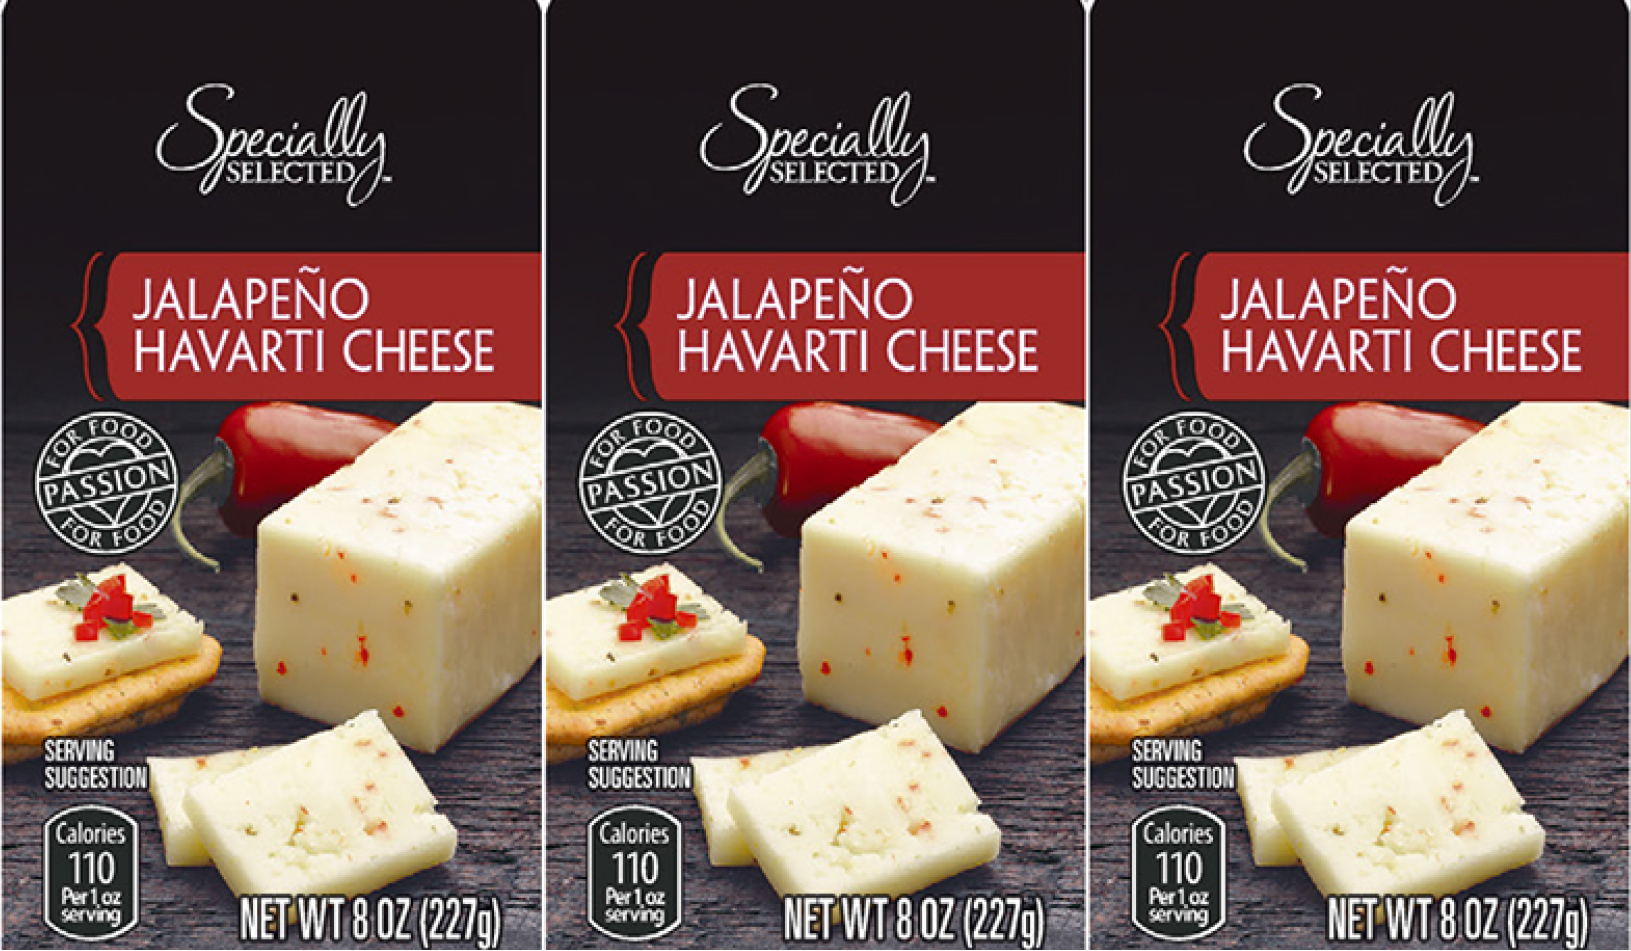 Jalapeno Havarti Cheese2